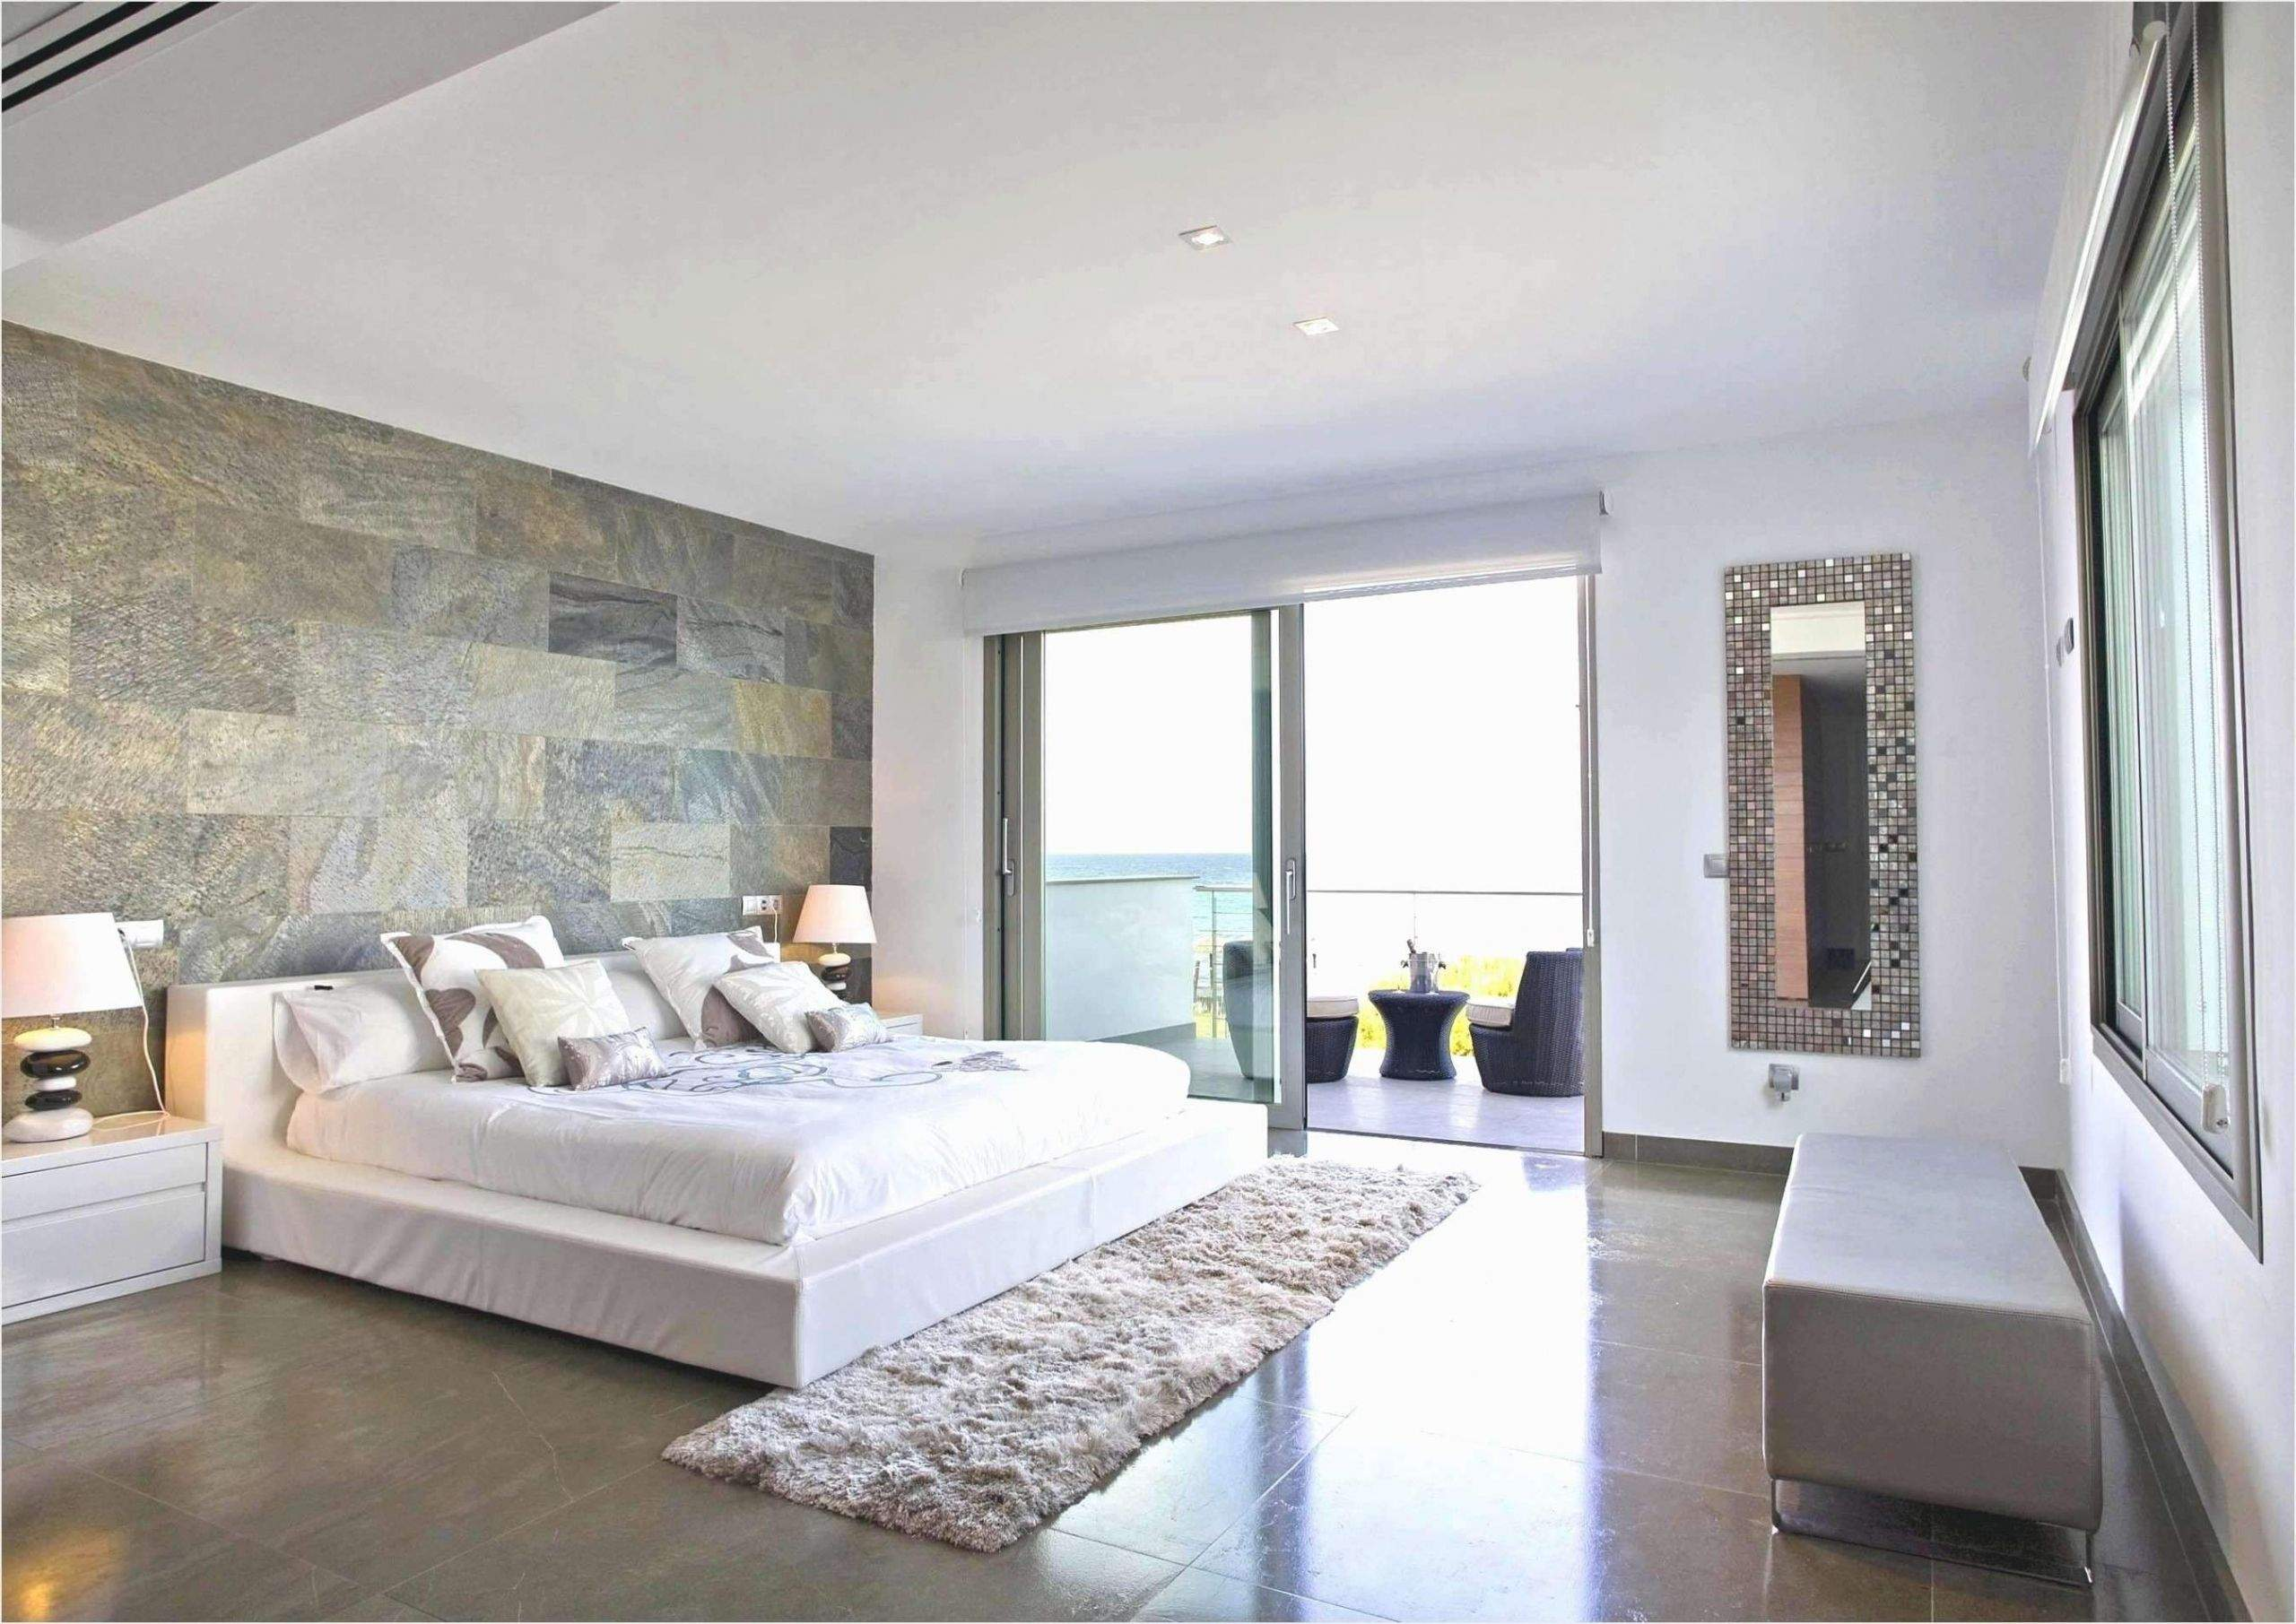 wohnzimmer beleuchtung modern genial wohnzimmer of wohnzimmer beleuchtung modern scaled